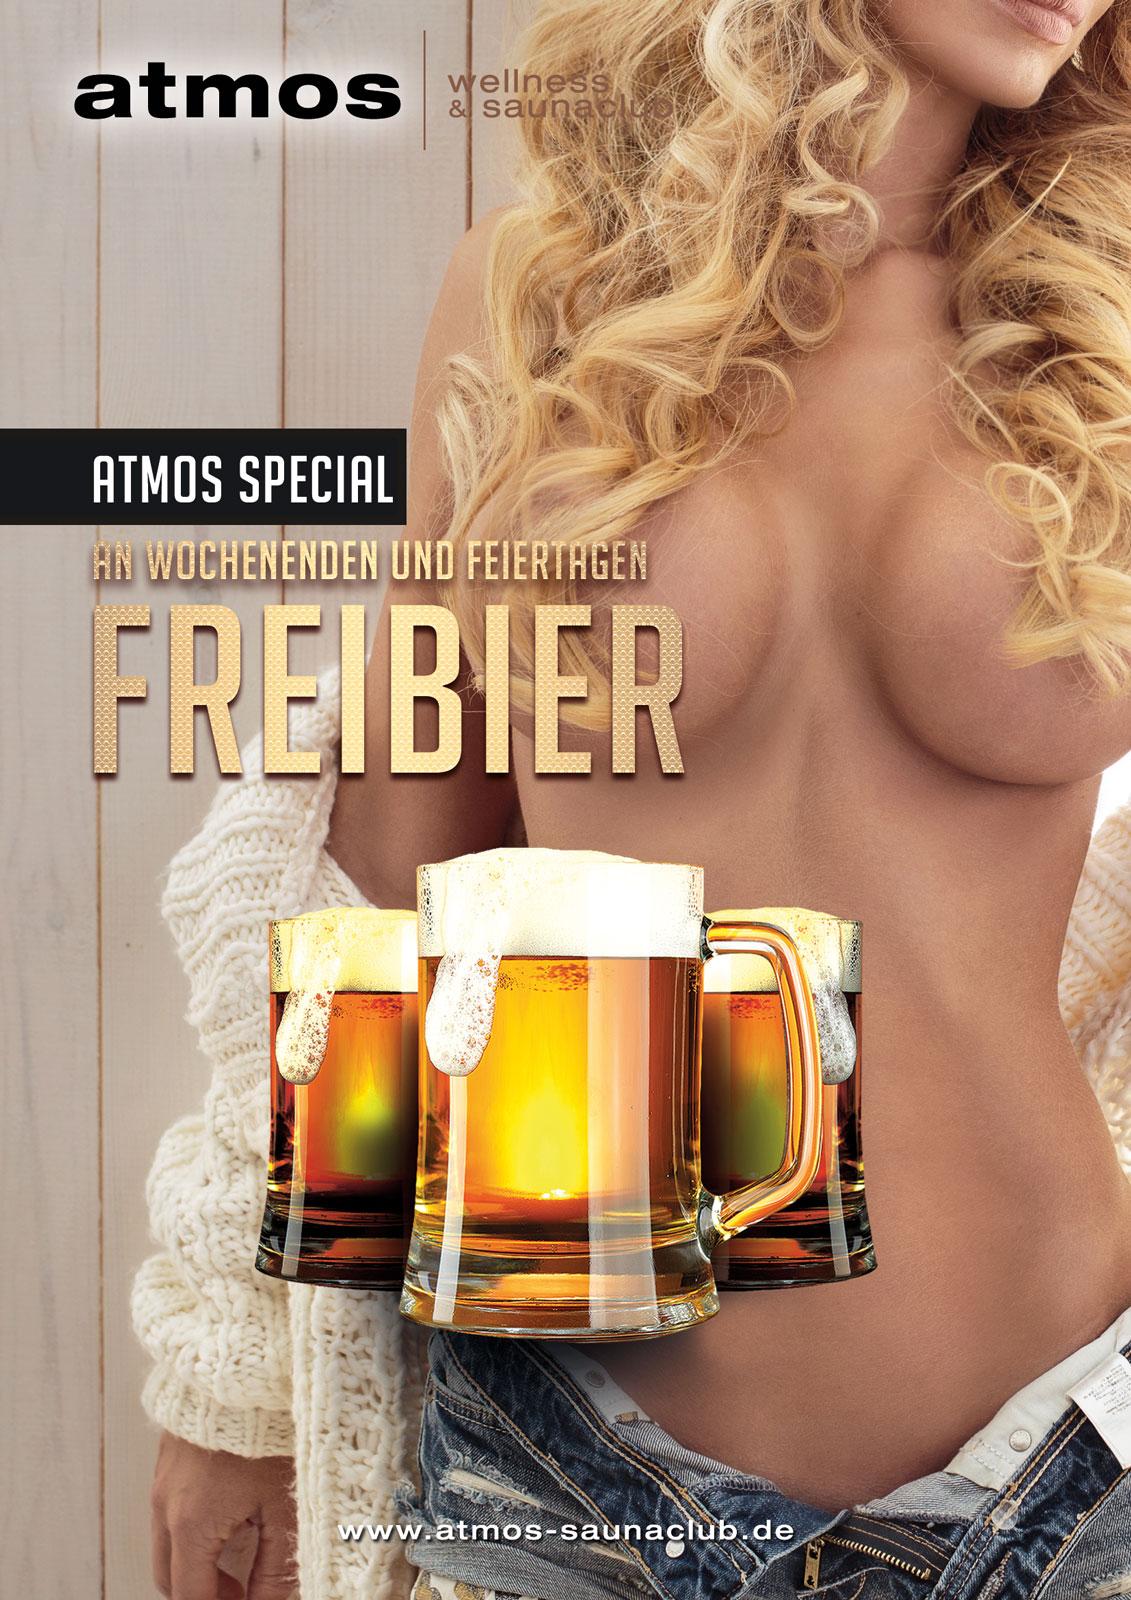 atmos_freibier_2017-10-03_web